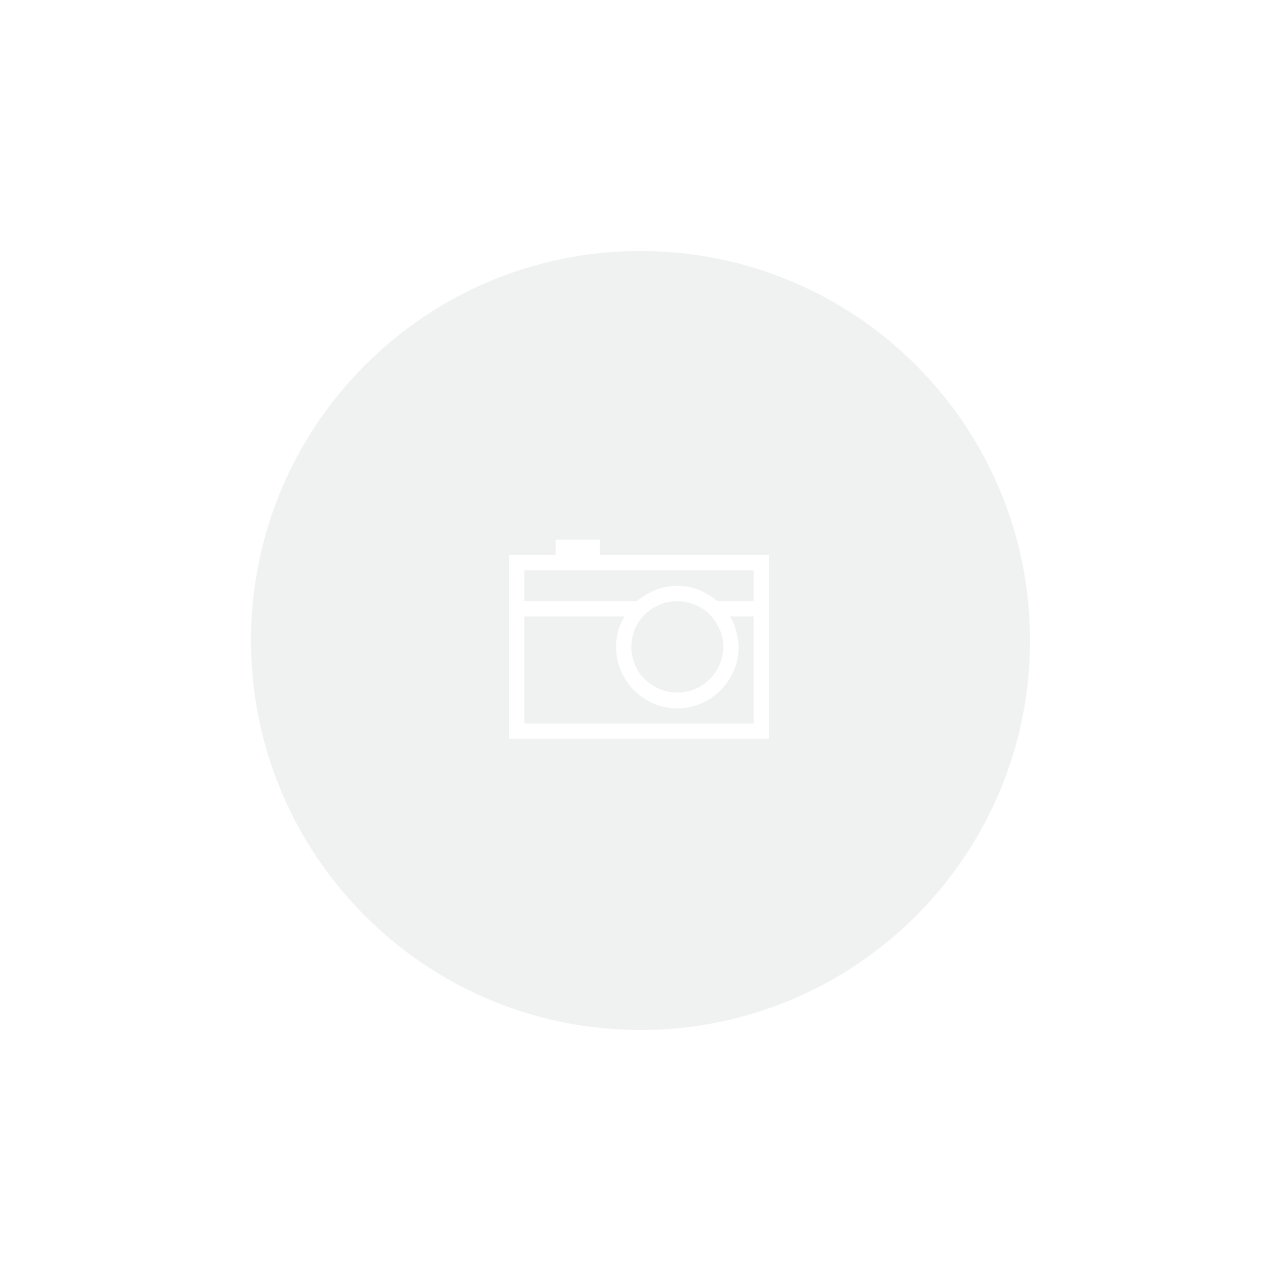 Placa de Vídeo Powercolor RX 580 8GB RED Dragon AXRX 8GBD5-3DHDV2/OC